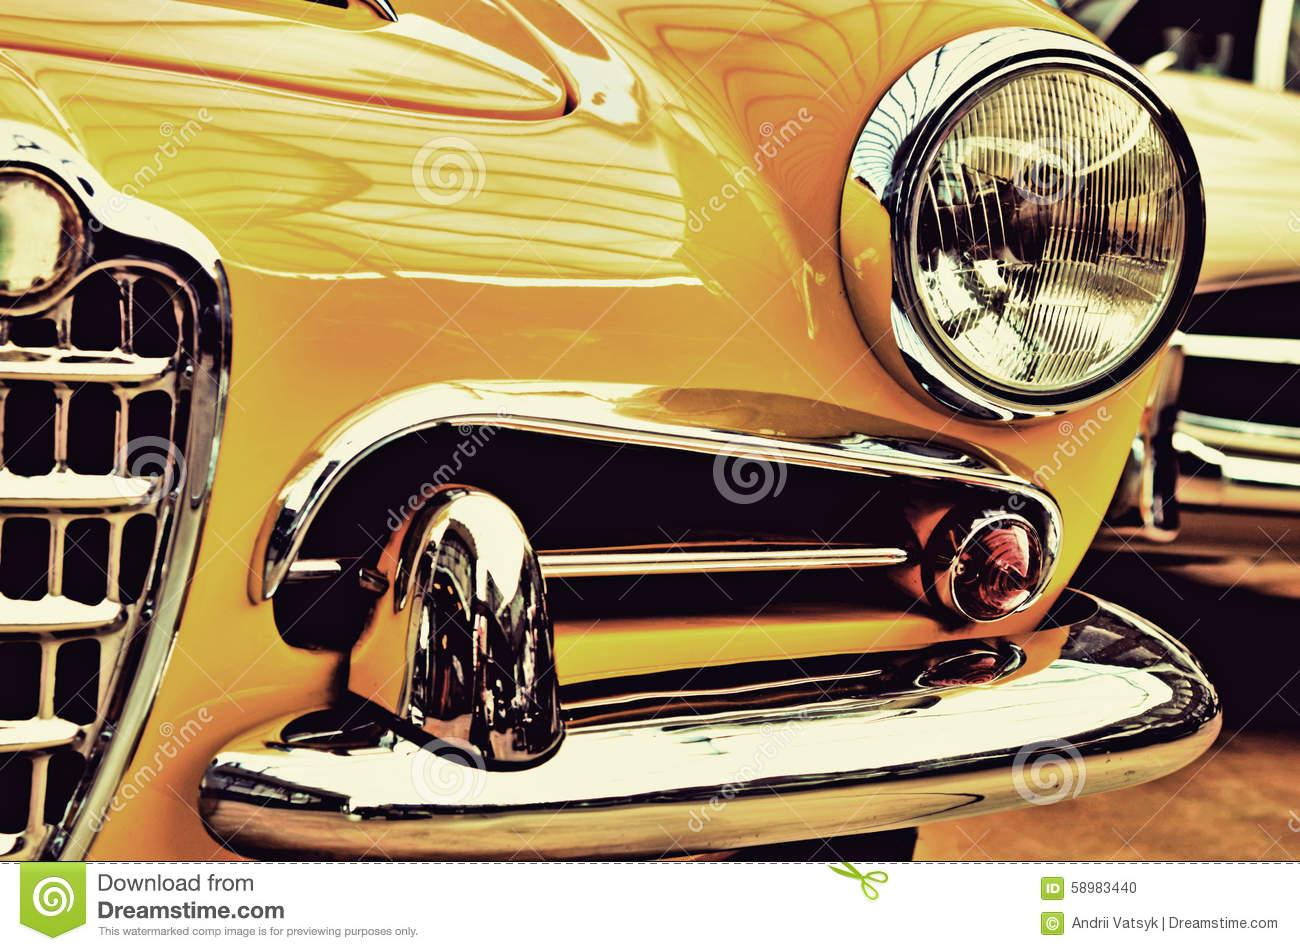 The Hood, Bumper, Headlight And Radiator Of Stylish Yellow Vinta.